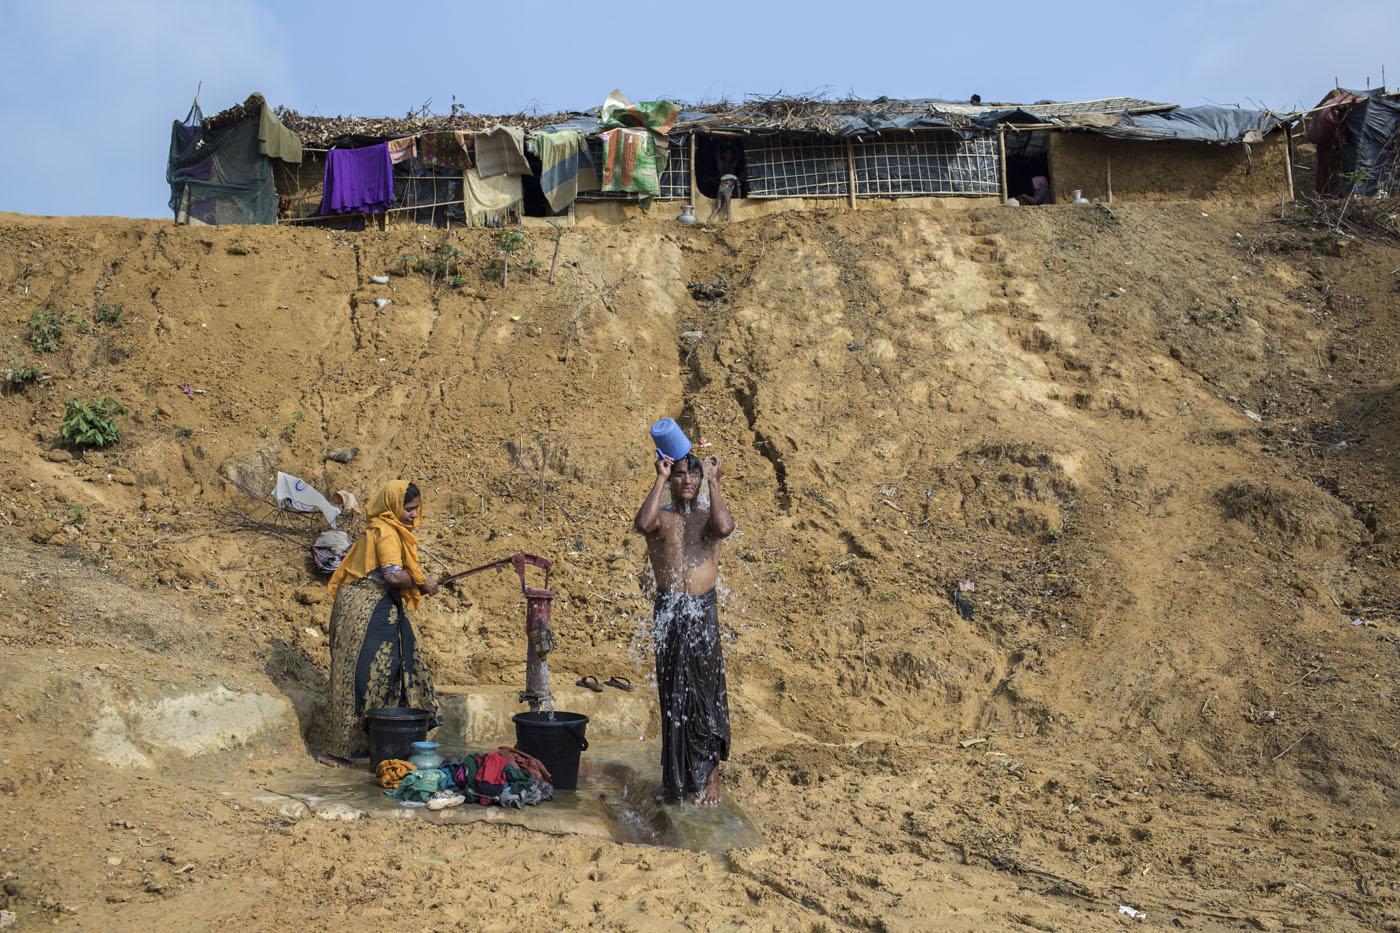 Probal Rashid_Bangladesh_The Rohingyas-A People Without A Home_17.jpg